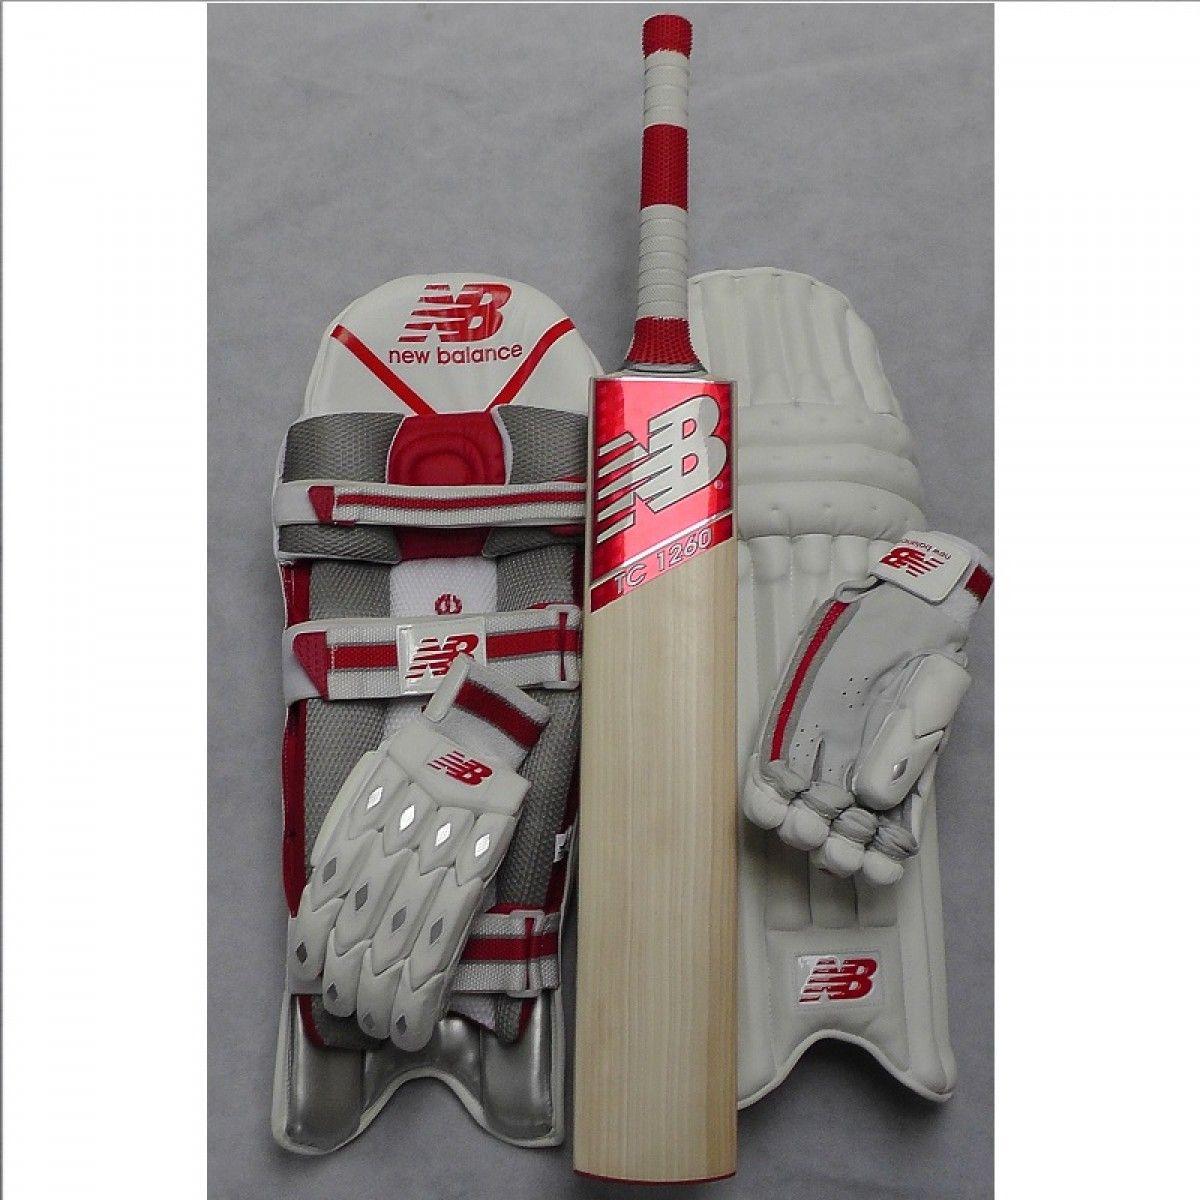 New Balance Cricket Bats Cricket Bat New Balance Cricket